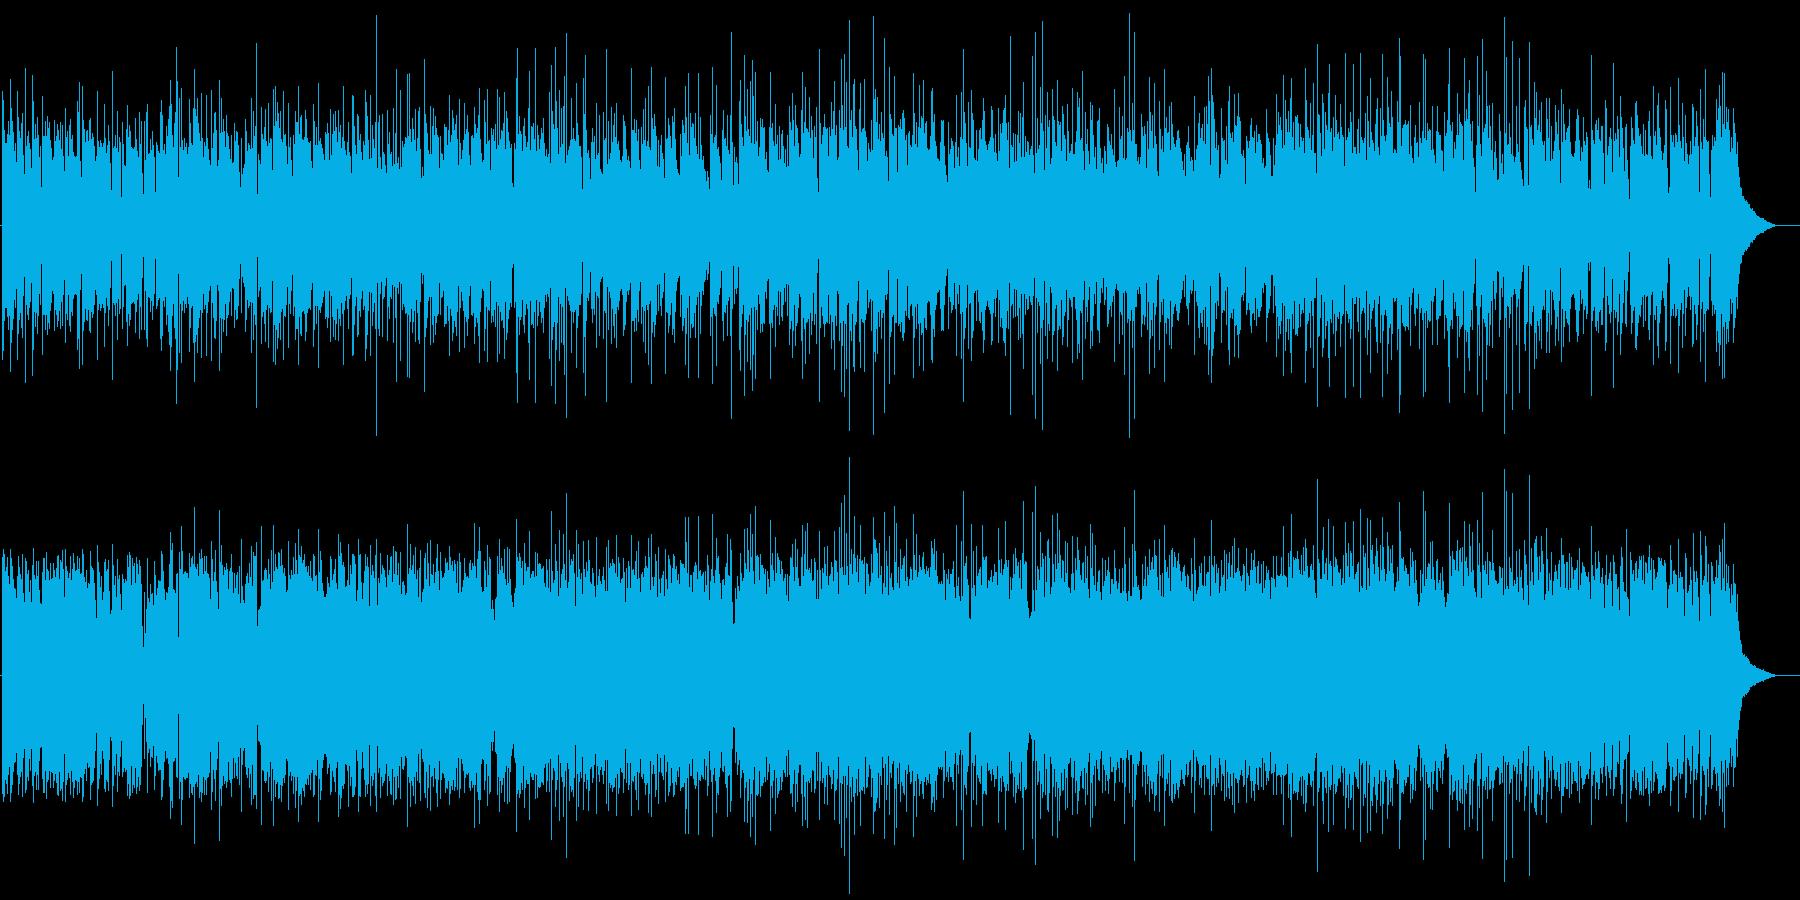 Old Black Joe (ギター)の再生済みの波形